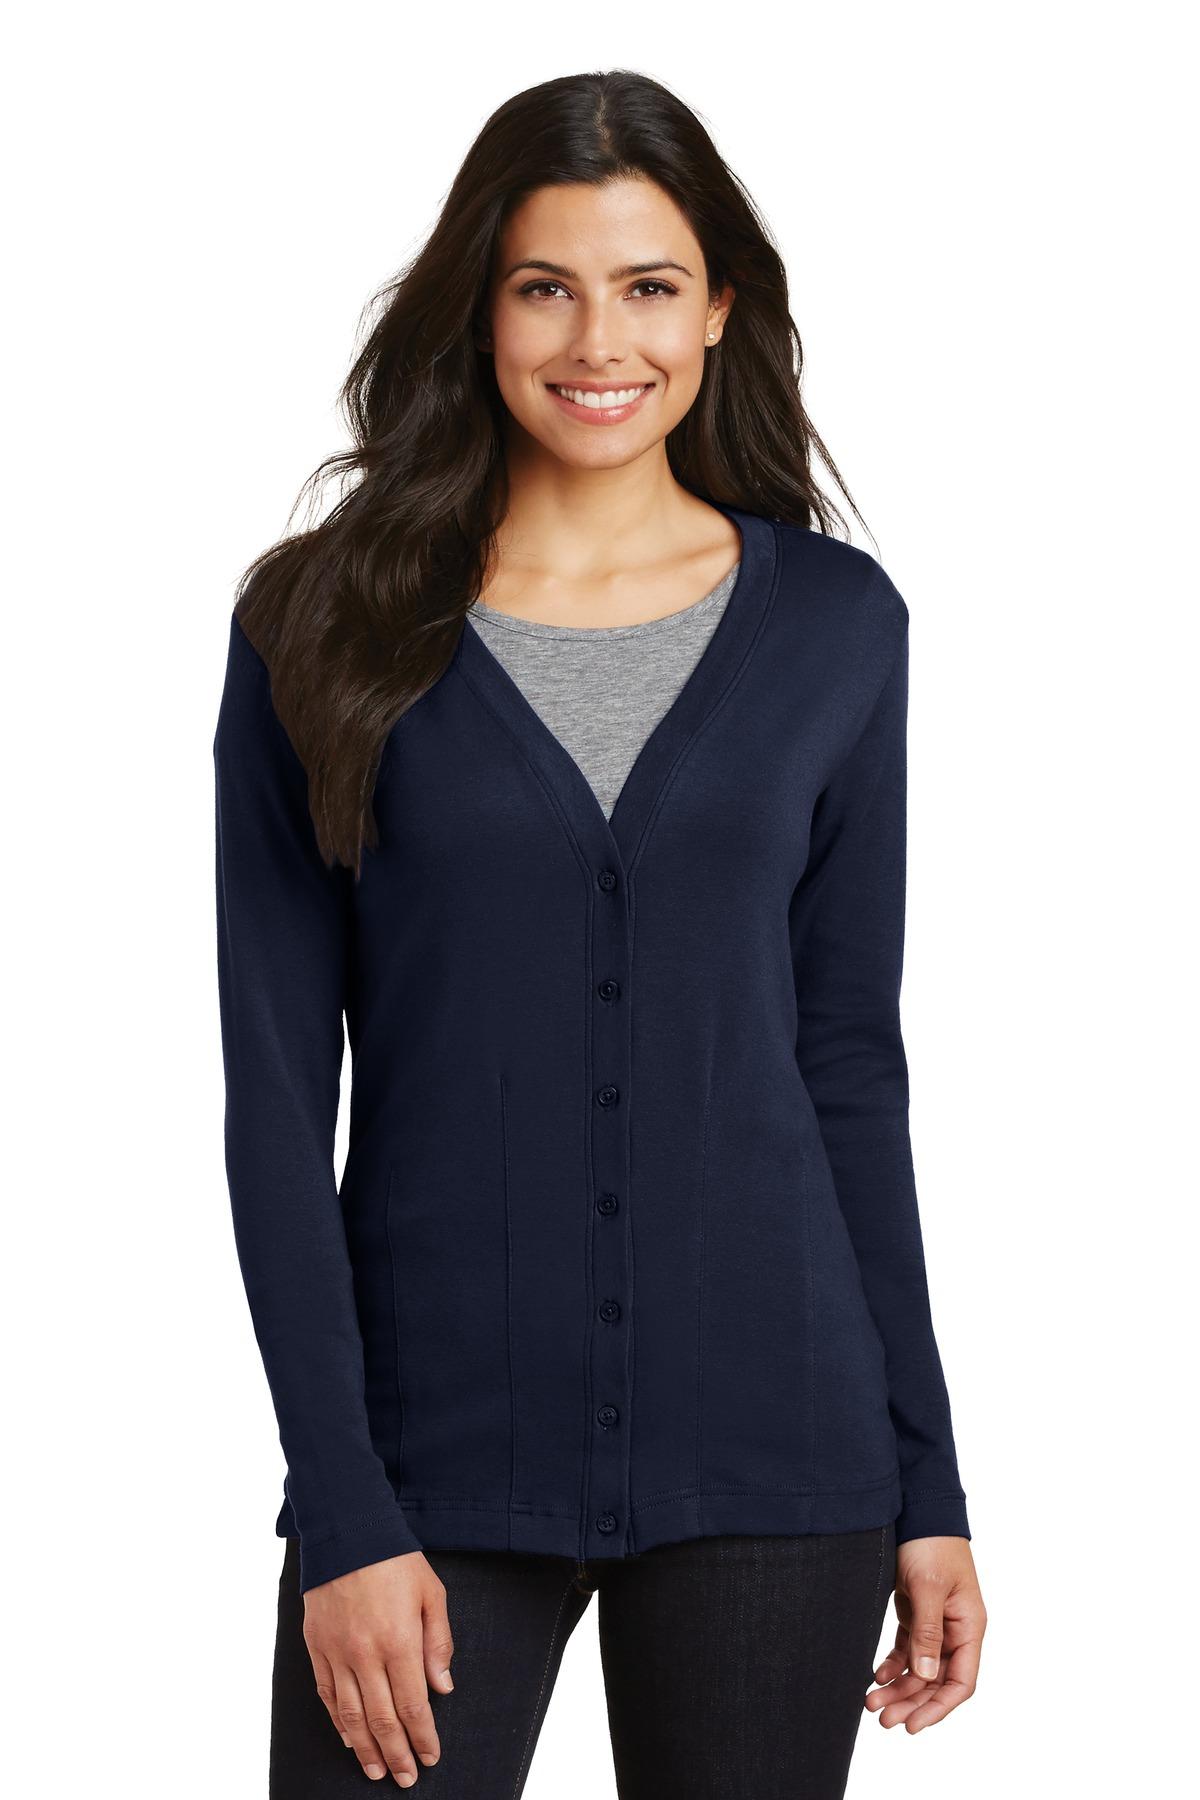 69ecf9937 Port Authority ® Ladies Modern Stretch Cotton Cardigan. L515